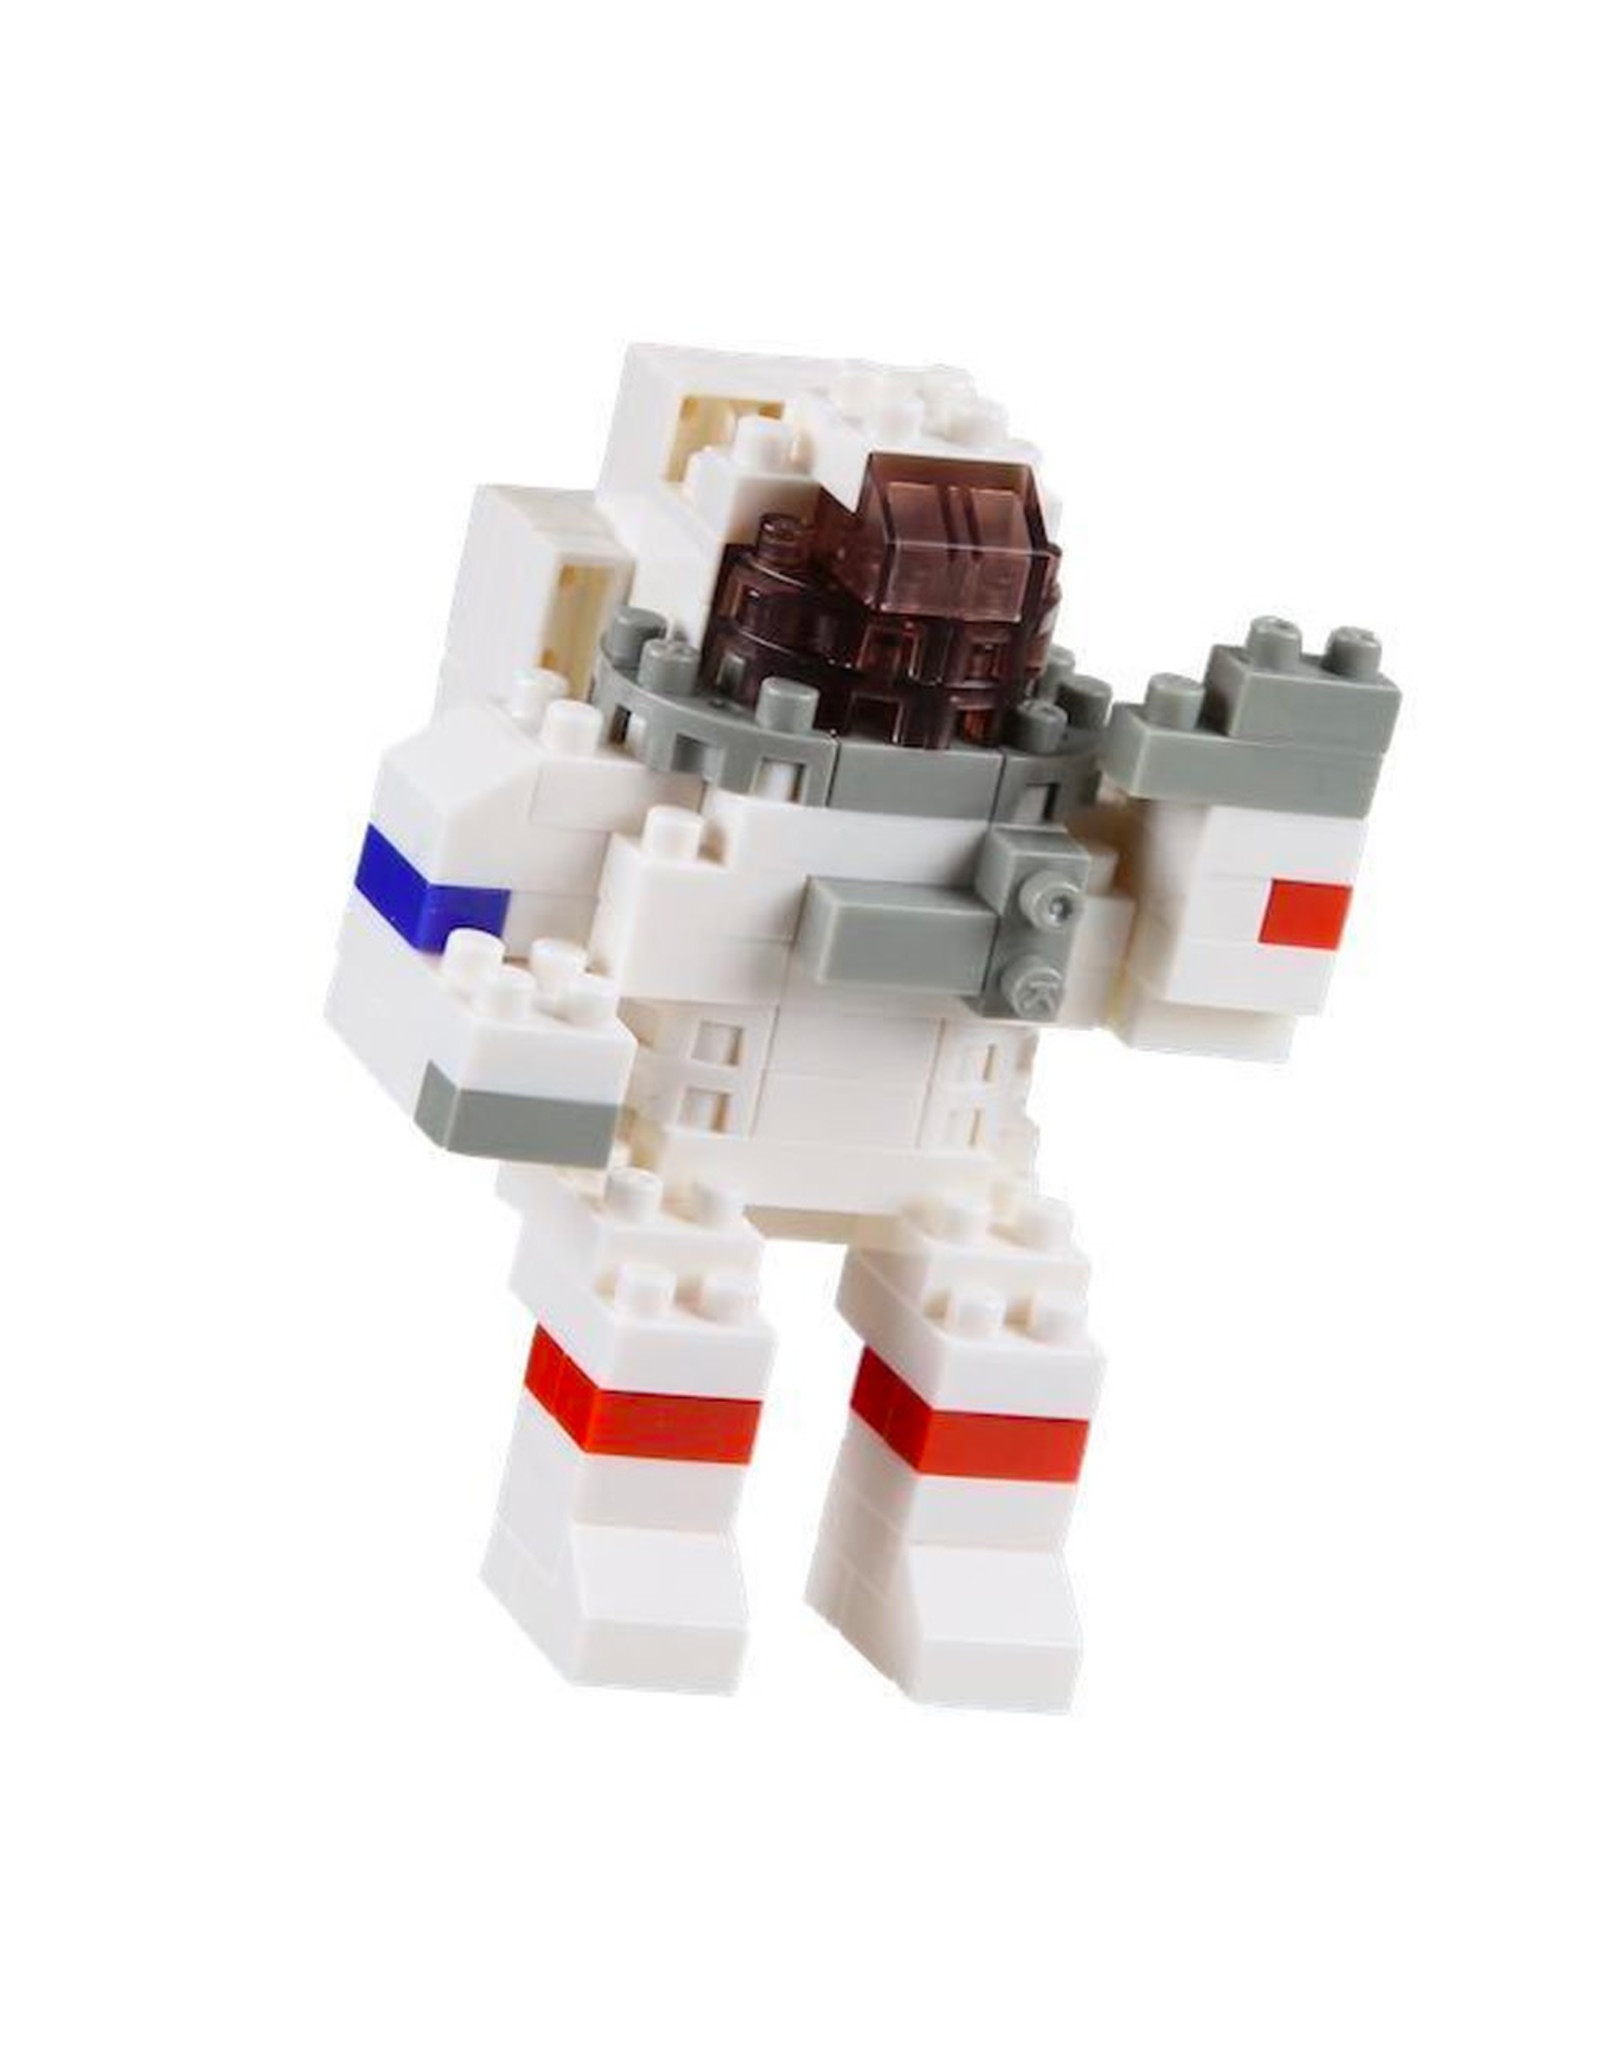 Nanoblock Astronaut